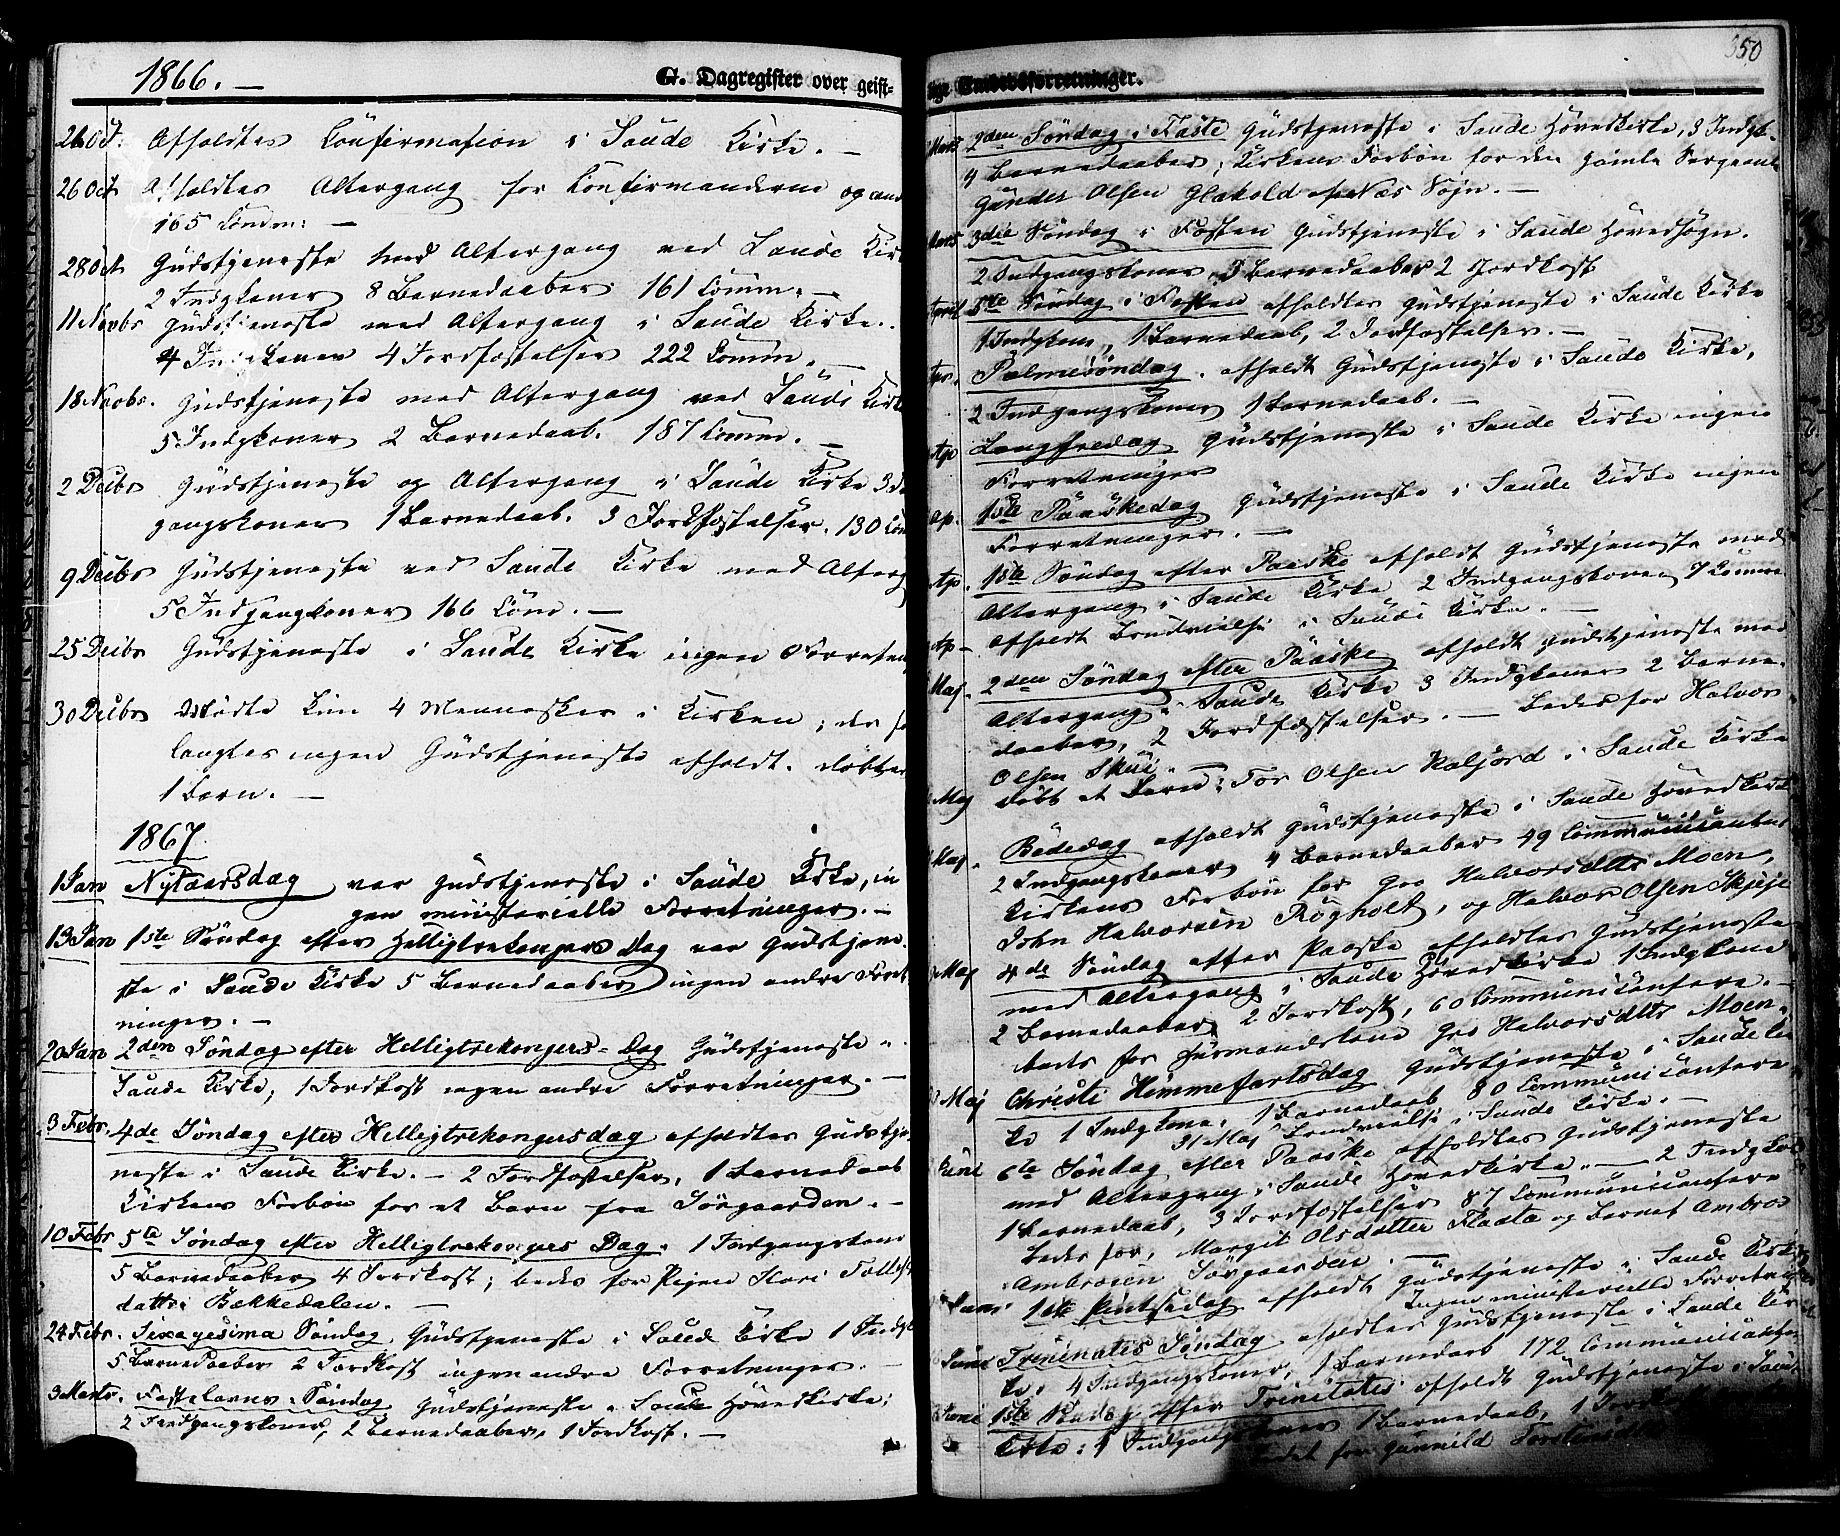 SAKO, Sauherad kirkebøker, F/Fa/L0007: Ministerialbok nr. I 7, 1851-1873, s. 350